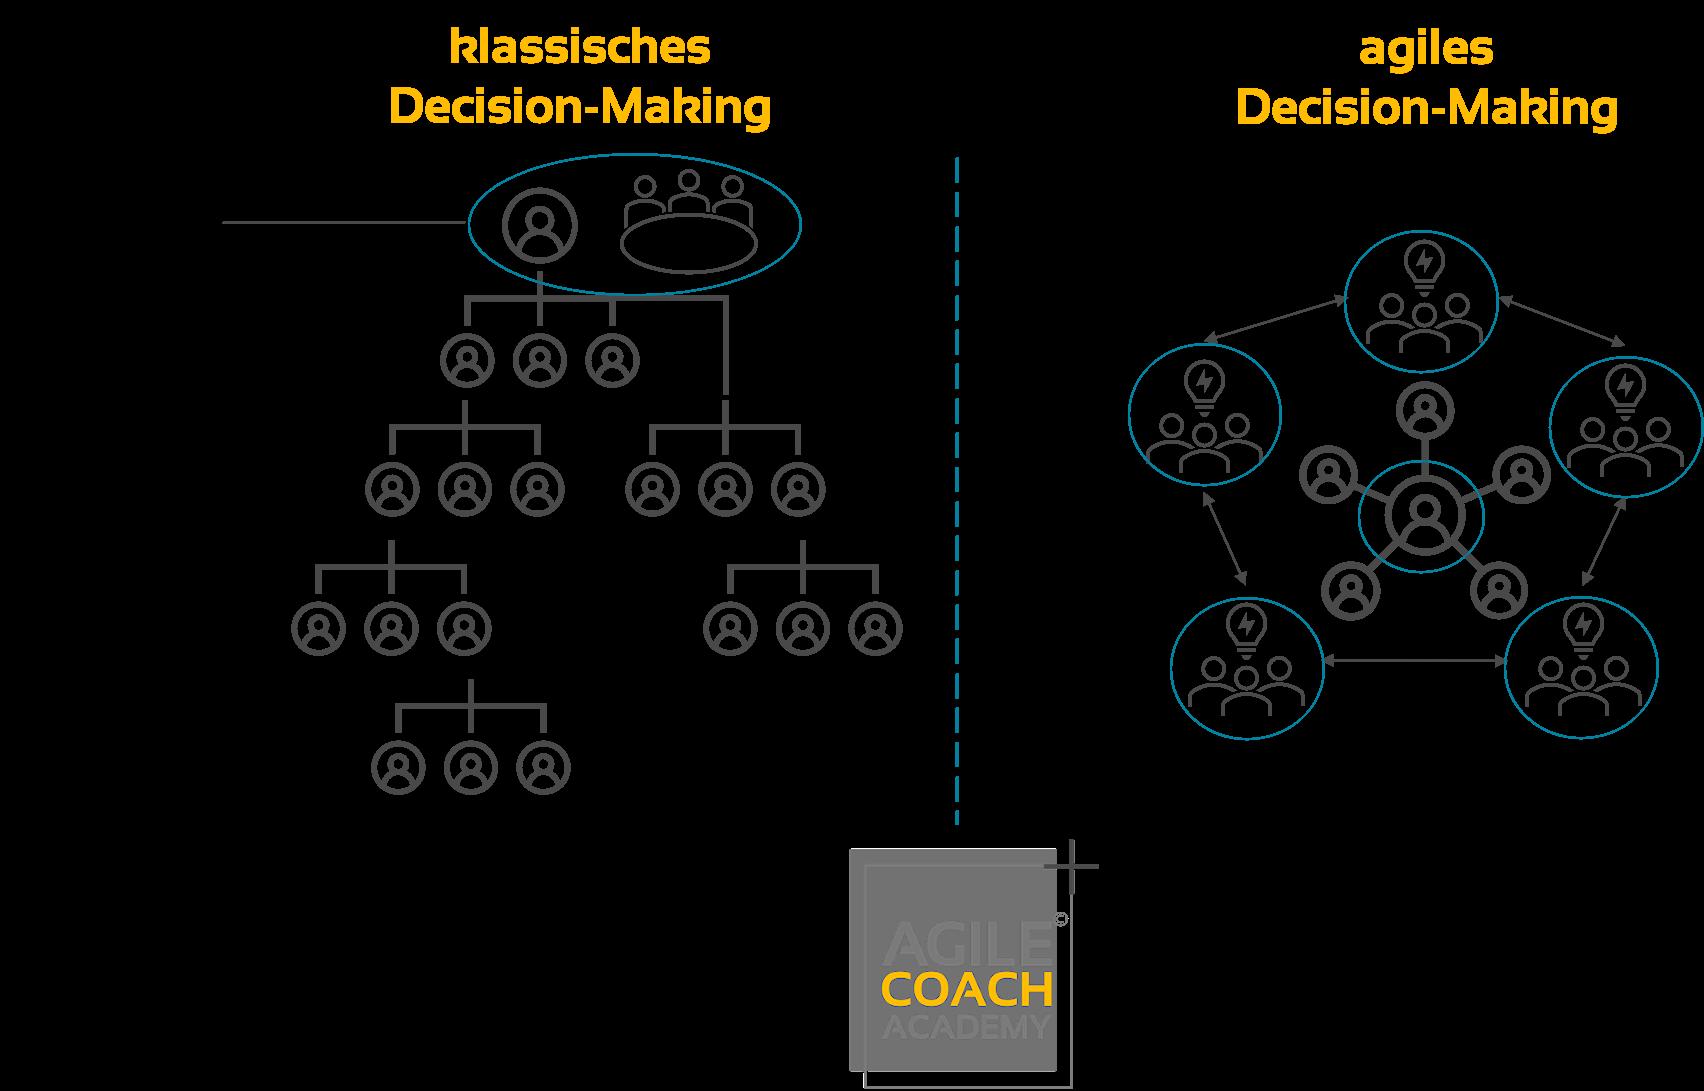 klassisches vs agiles Decision-Making